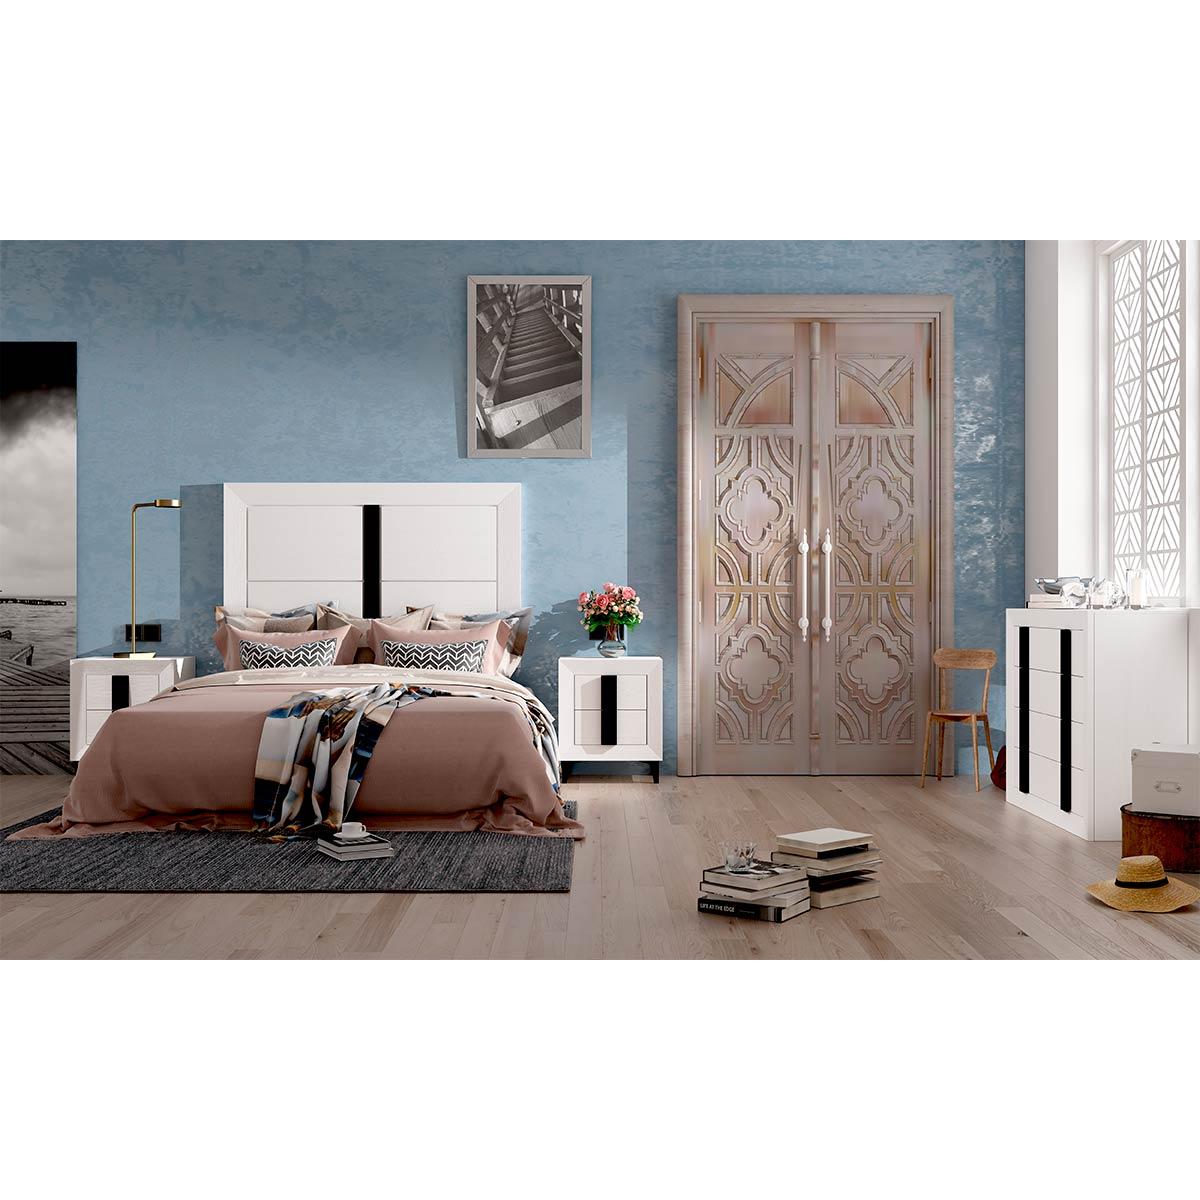 Dormitorio de matrimonio Viena 01 completo